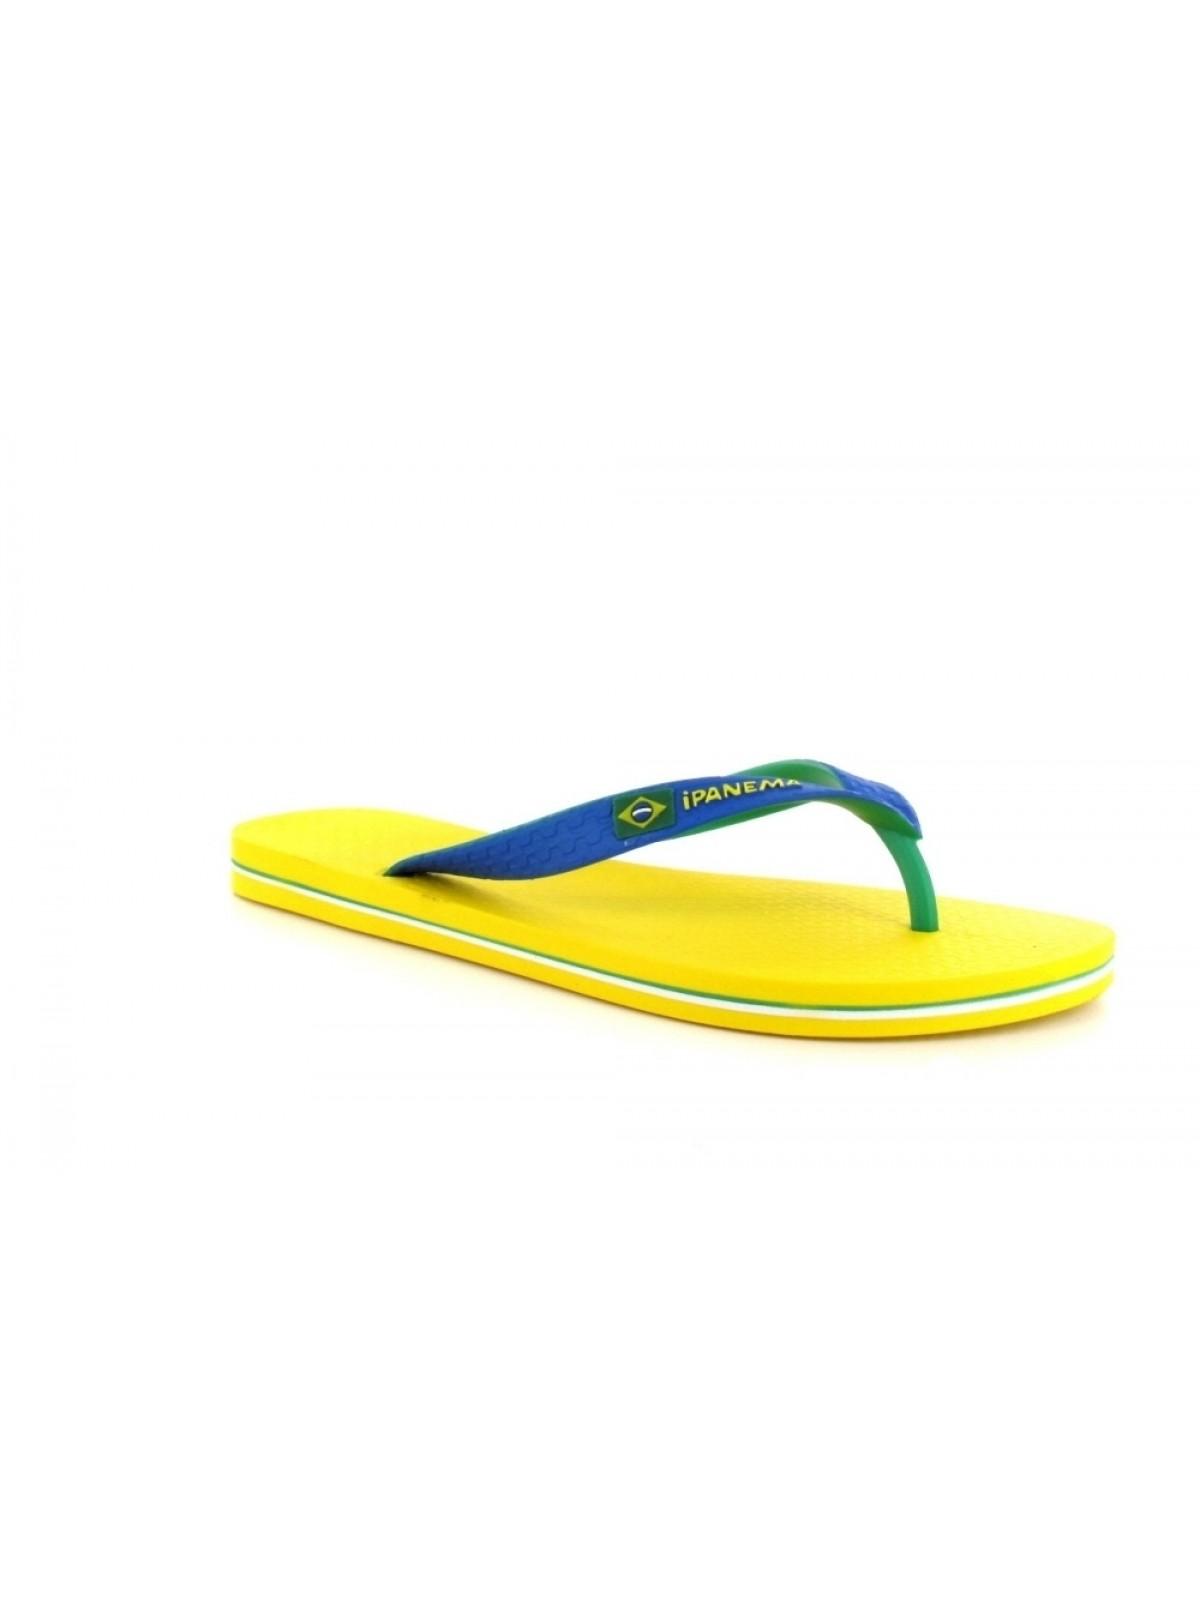 Ipanema Tong tricolore jaune / bleu